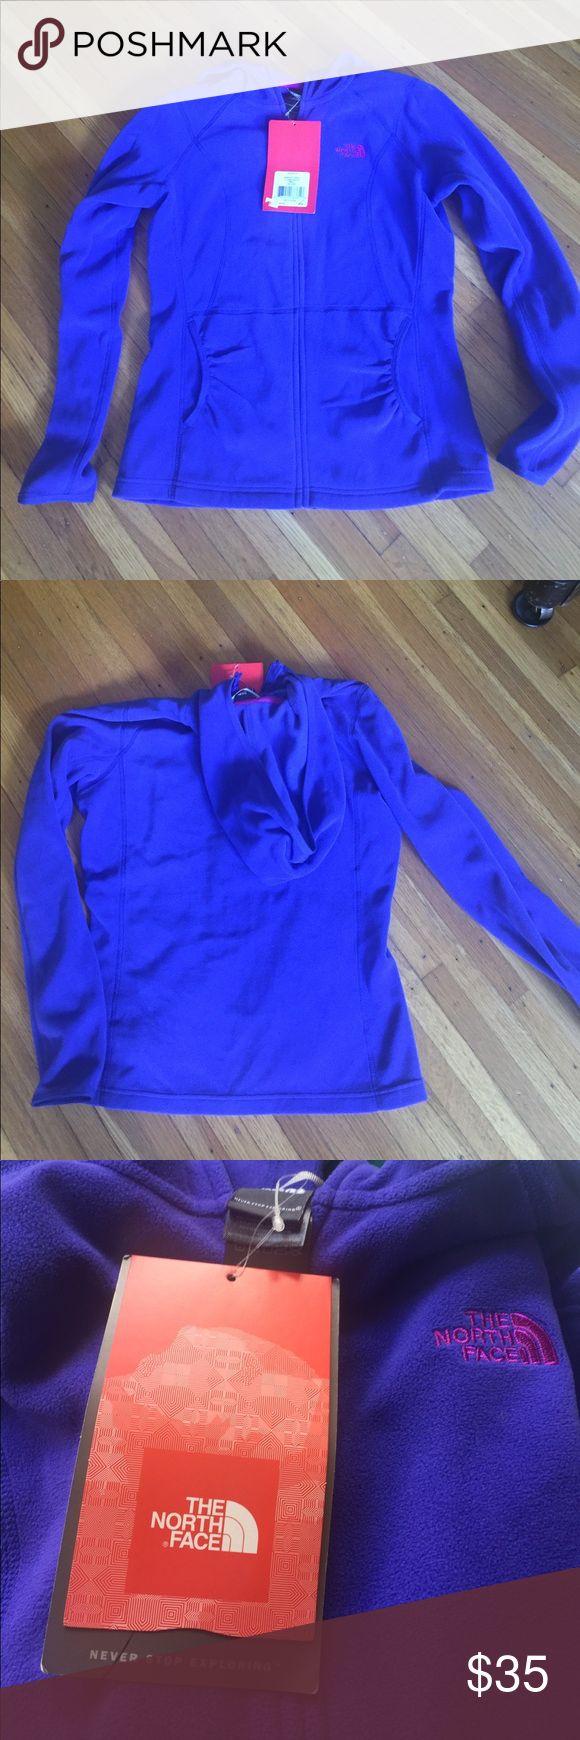 Small Purple North Face jacket W Masonic Hoodie, ultra marine blue, NWT North Face Jackets & Coats